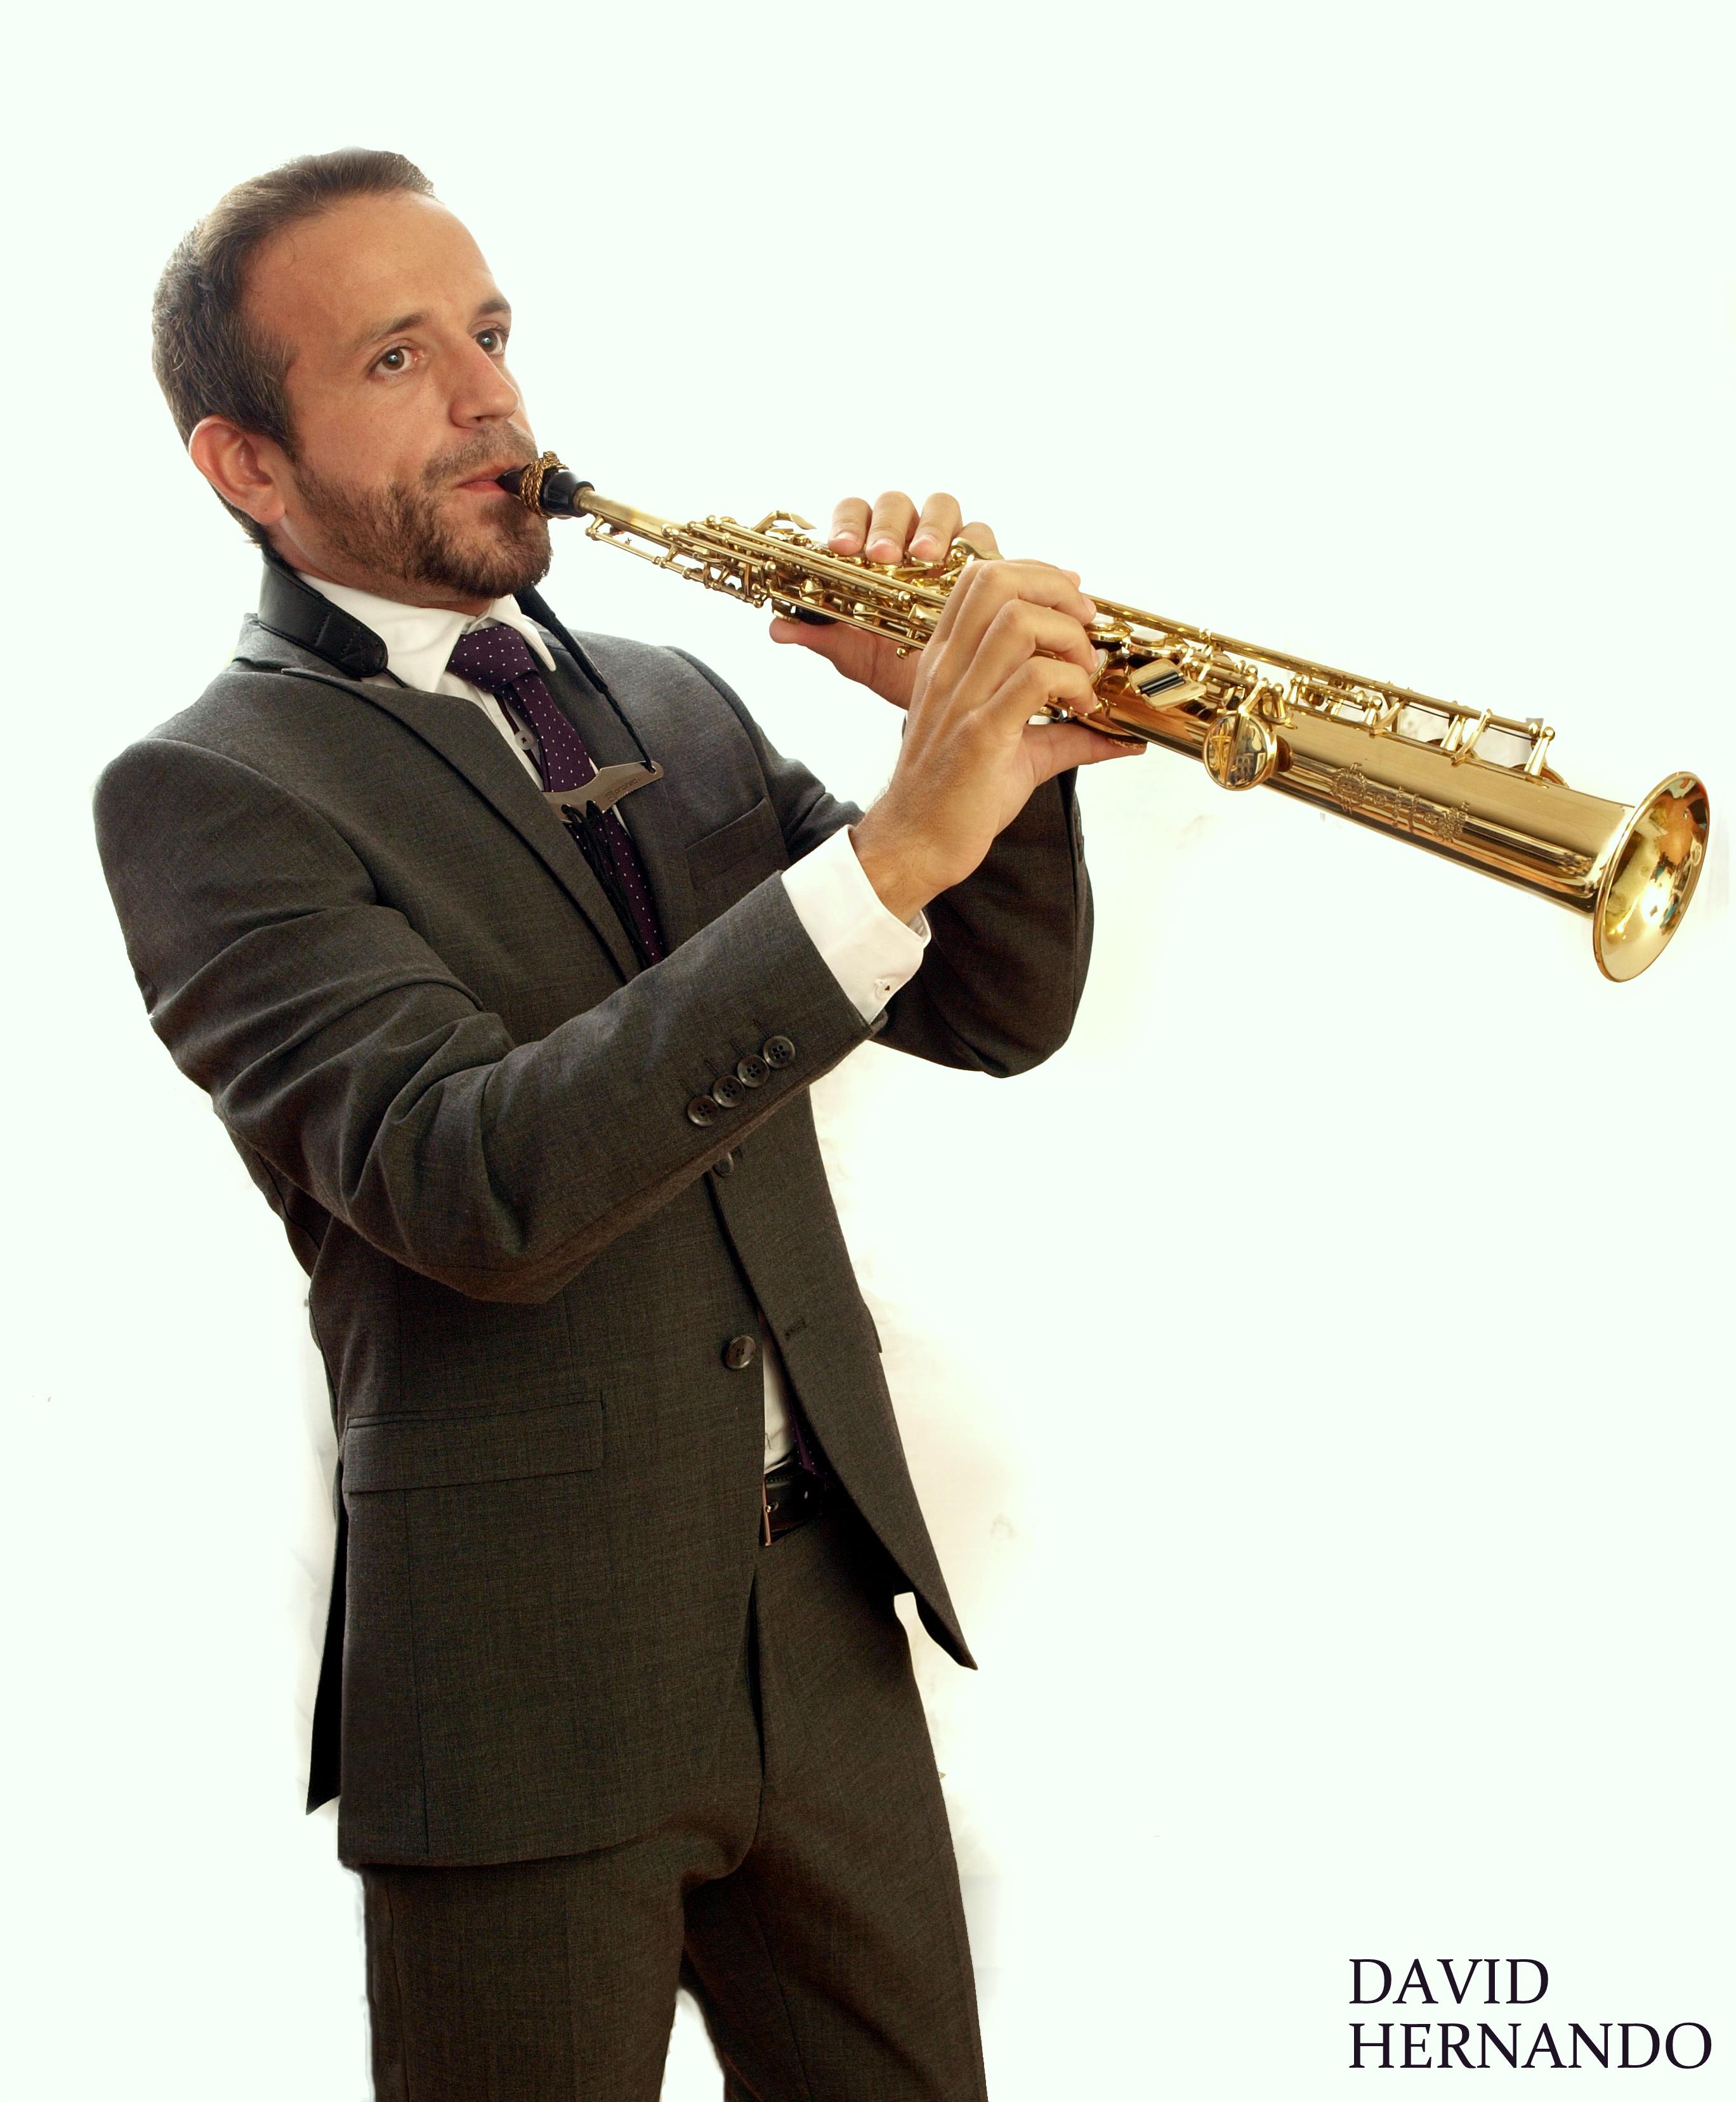 David Hernando saxofonista. 2018